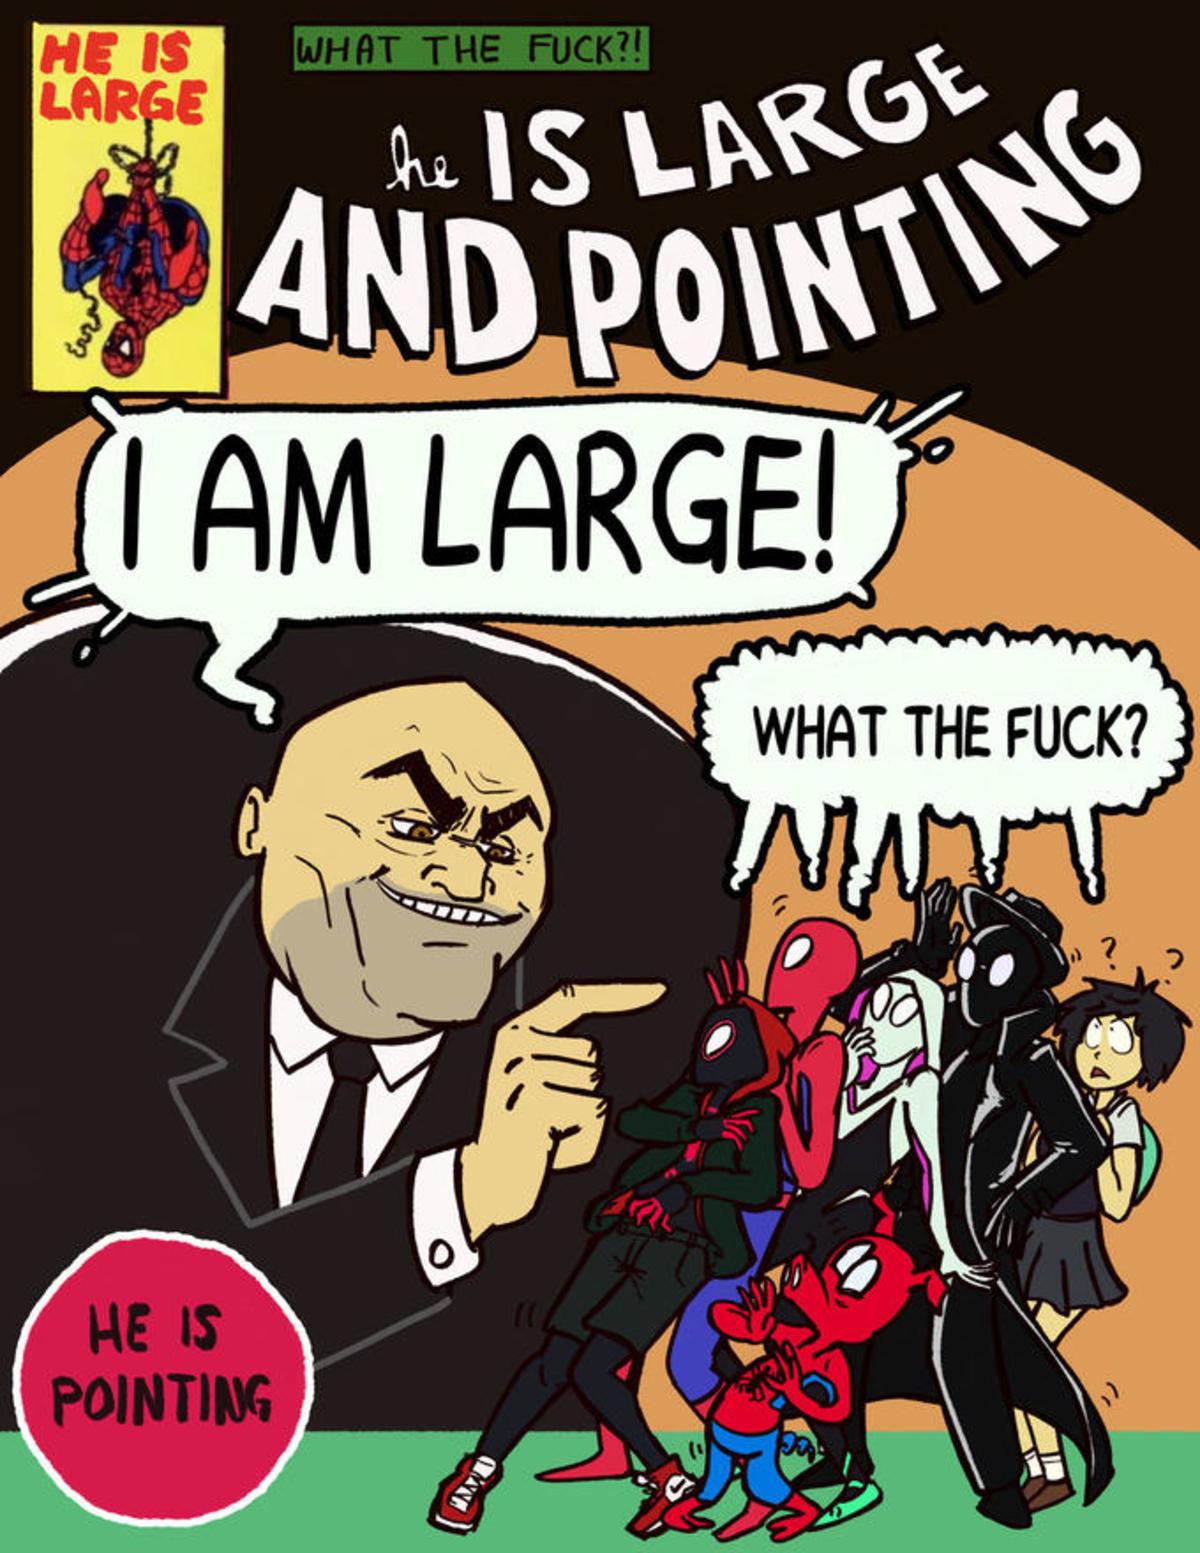 It's rude to point!. Artist Credit: @spaghoner https://twitter.com/spaghoner/status/1076226575920578560?lang=en.